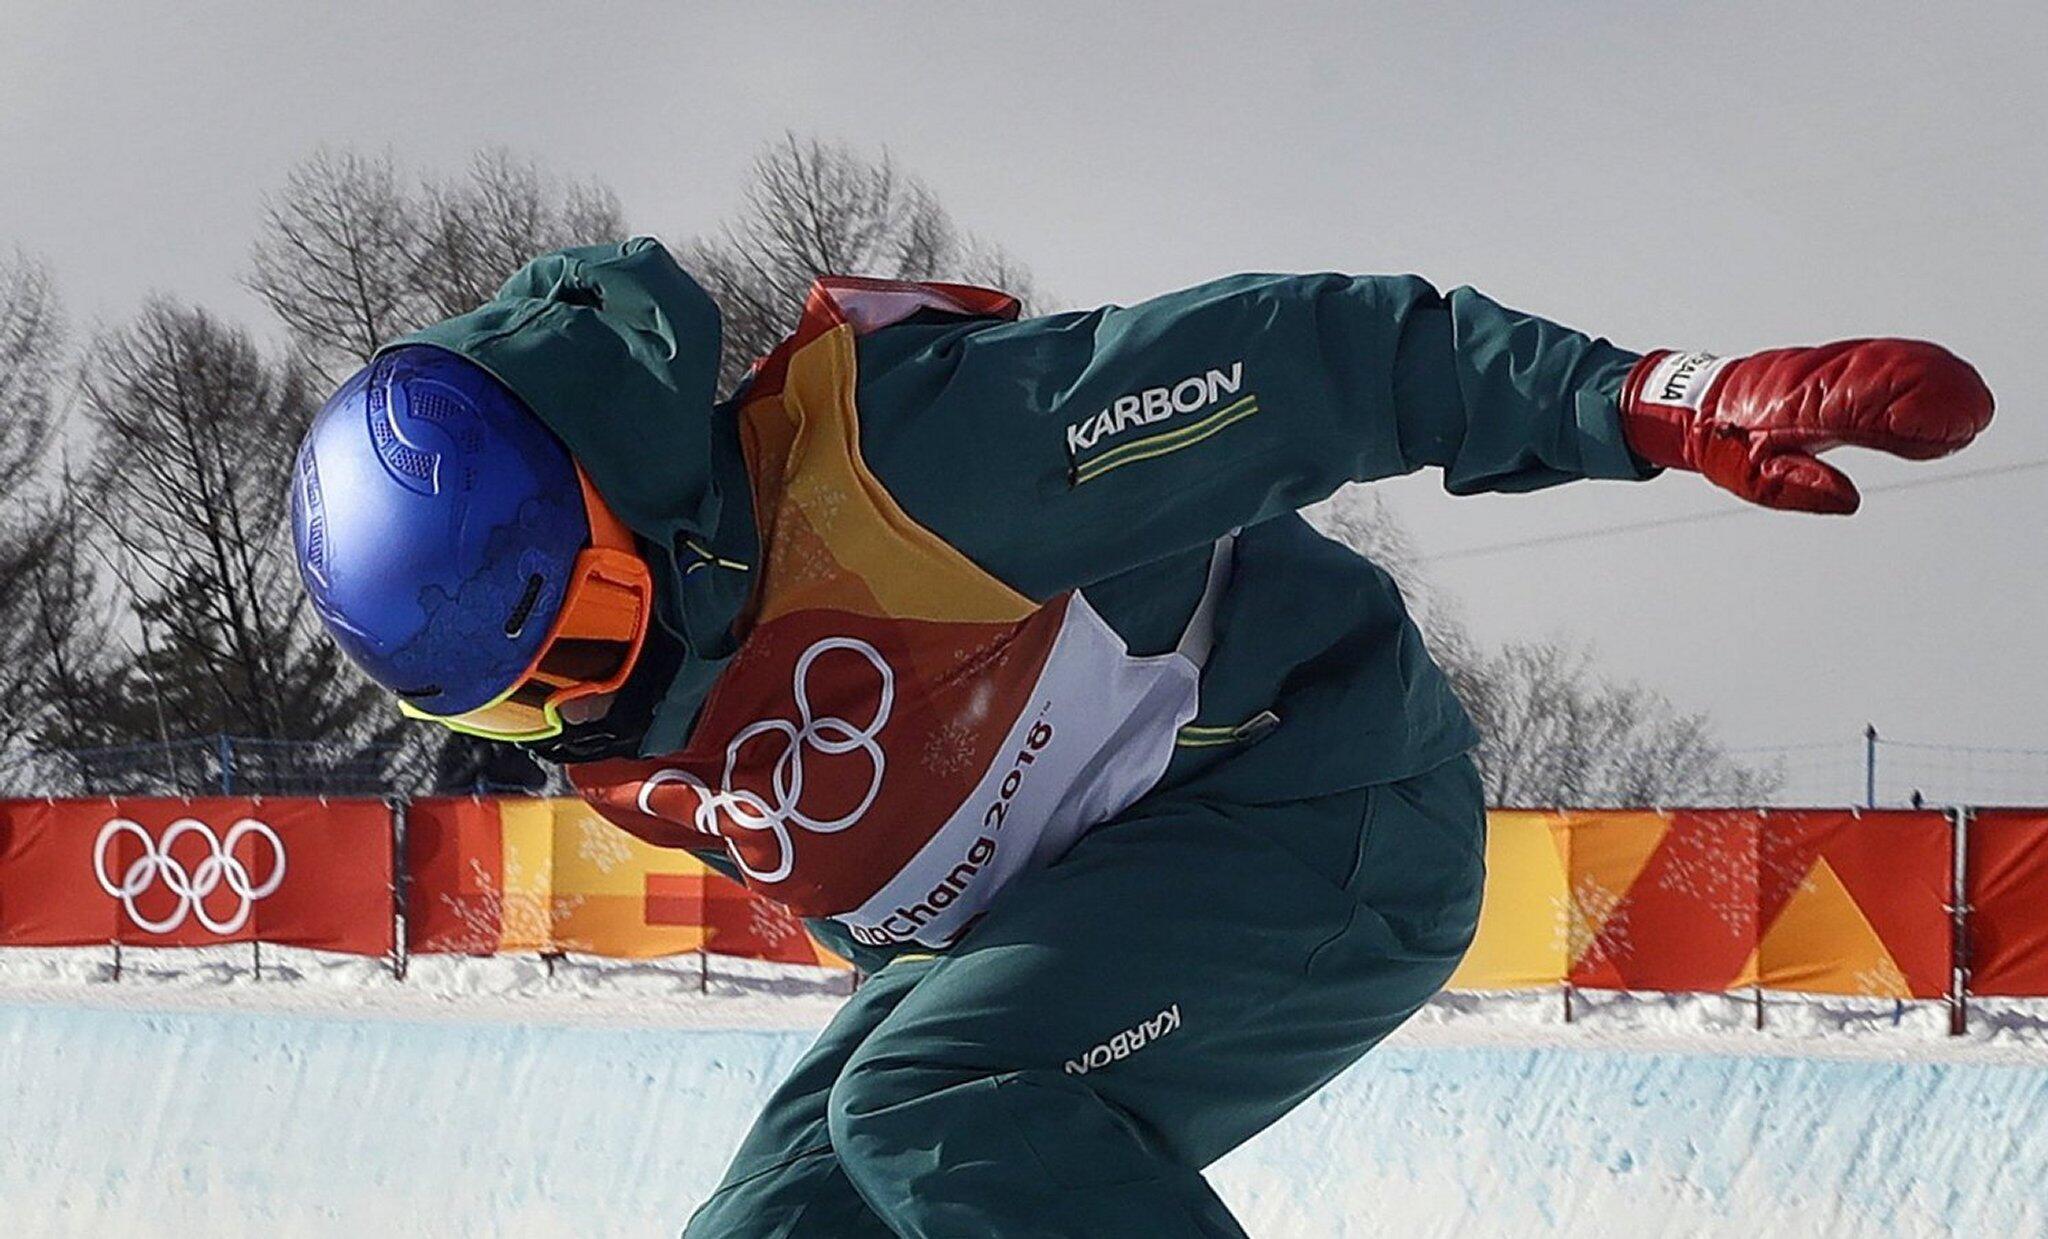 Bild zu Pyeongchang 2018 - Snowboard